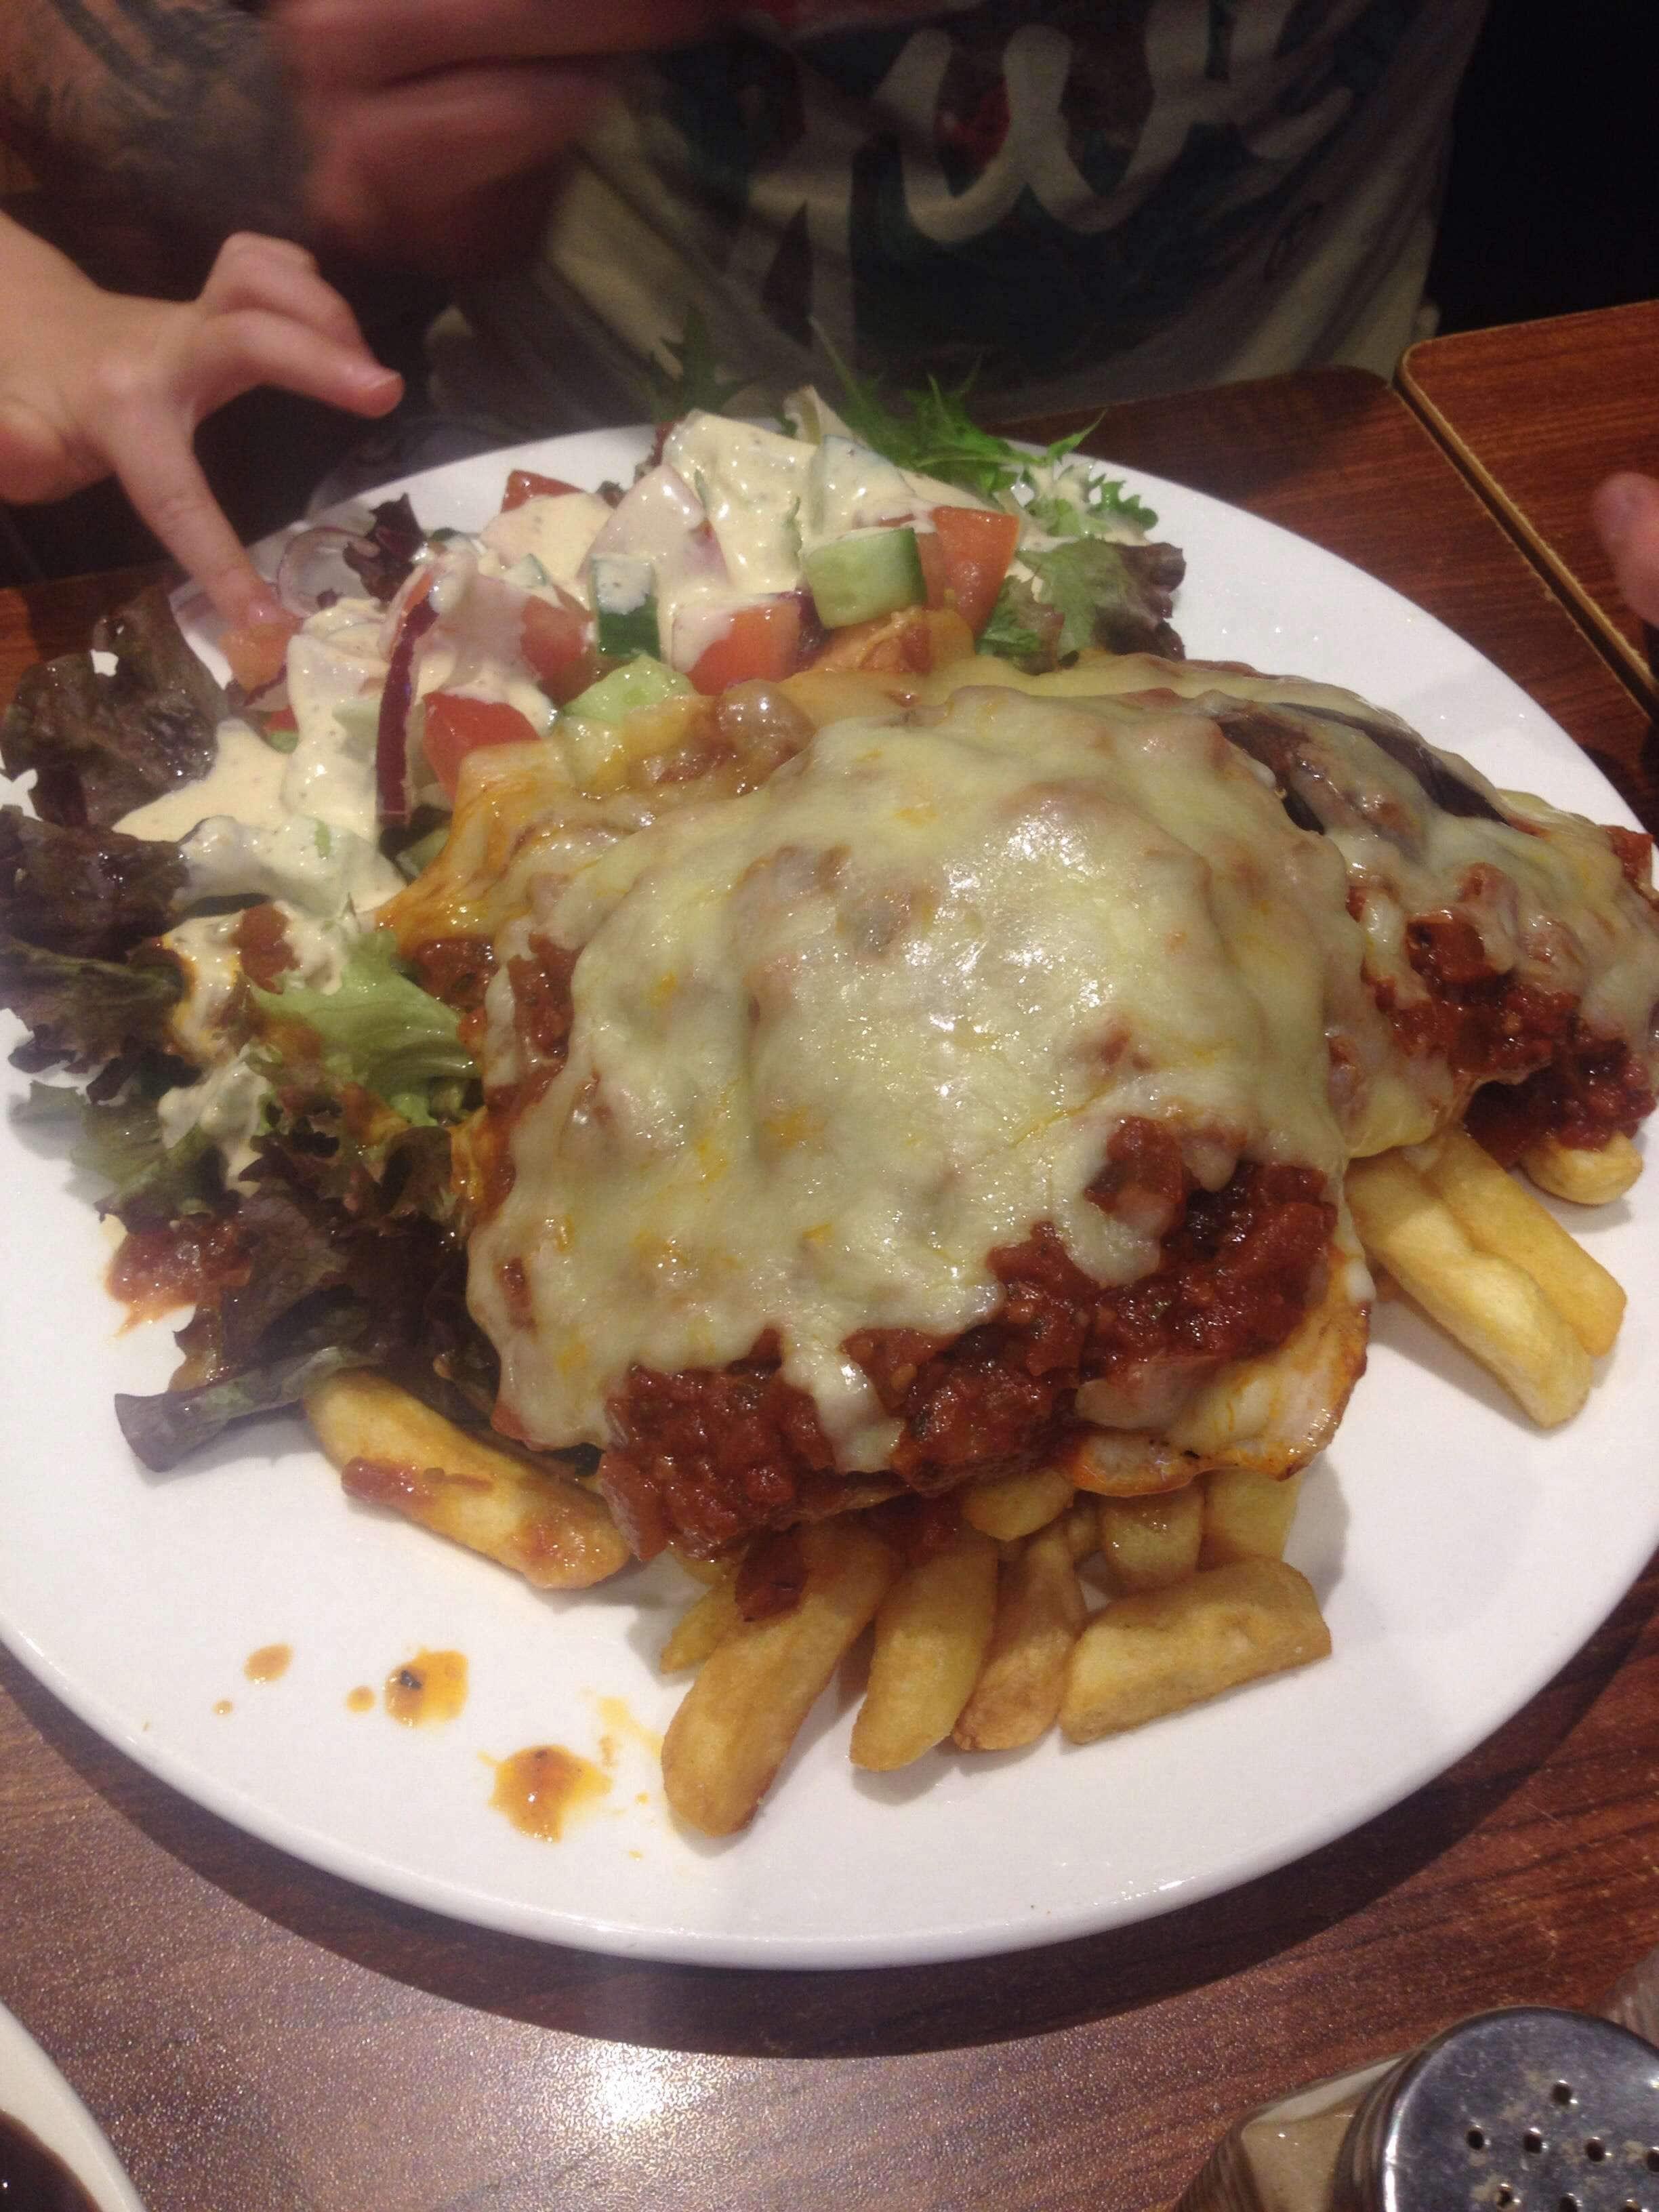 Krestas review for js kitchen steak house